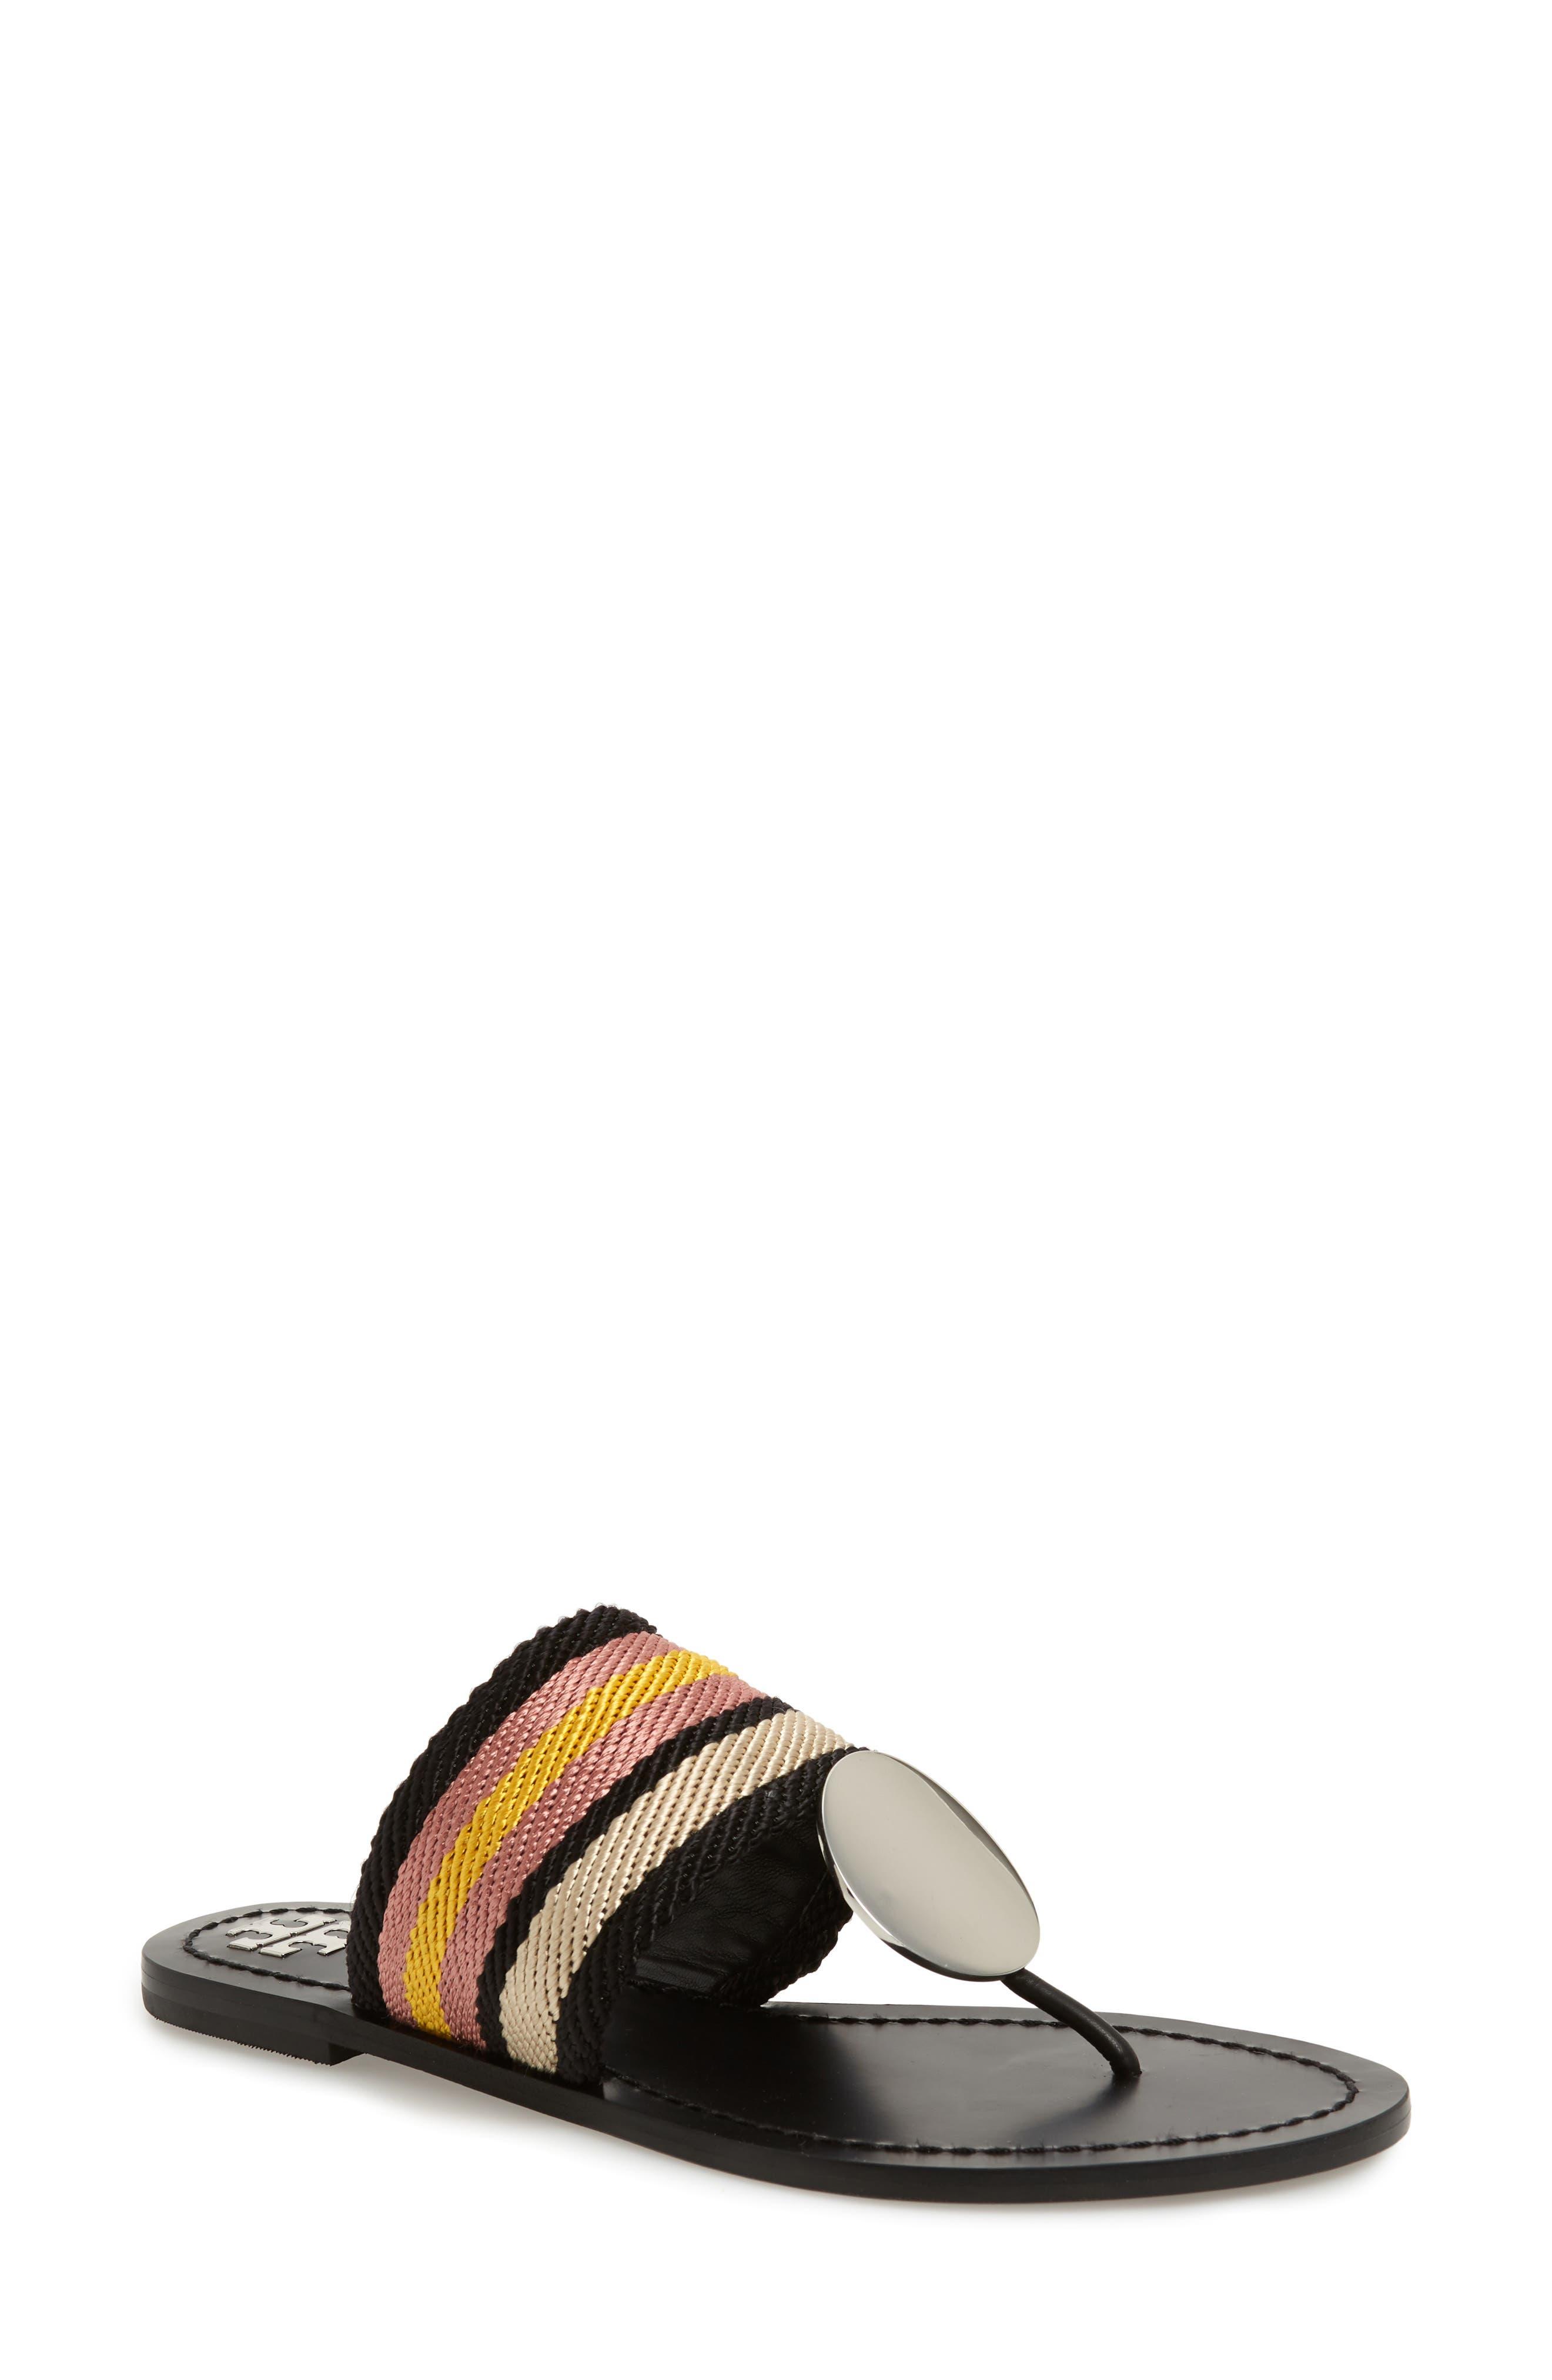 TORY BURCH Patos Sandal, Main, color, BLACK STRIPE/ PERFECT BLACK